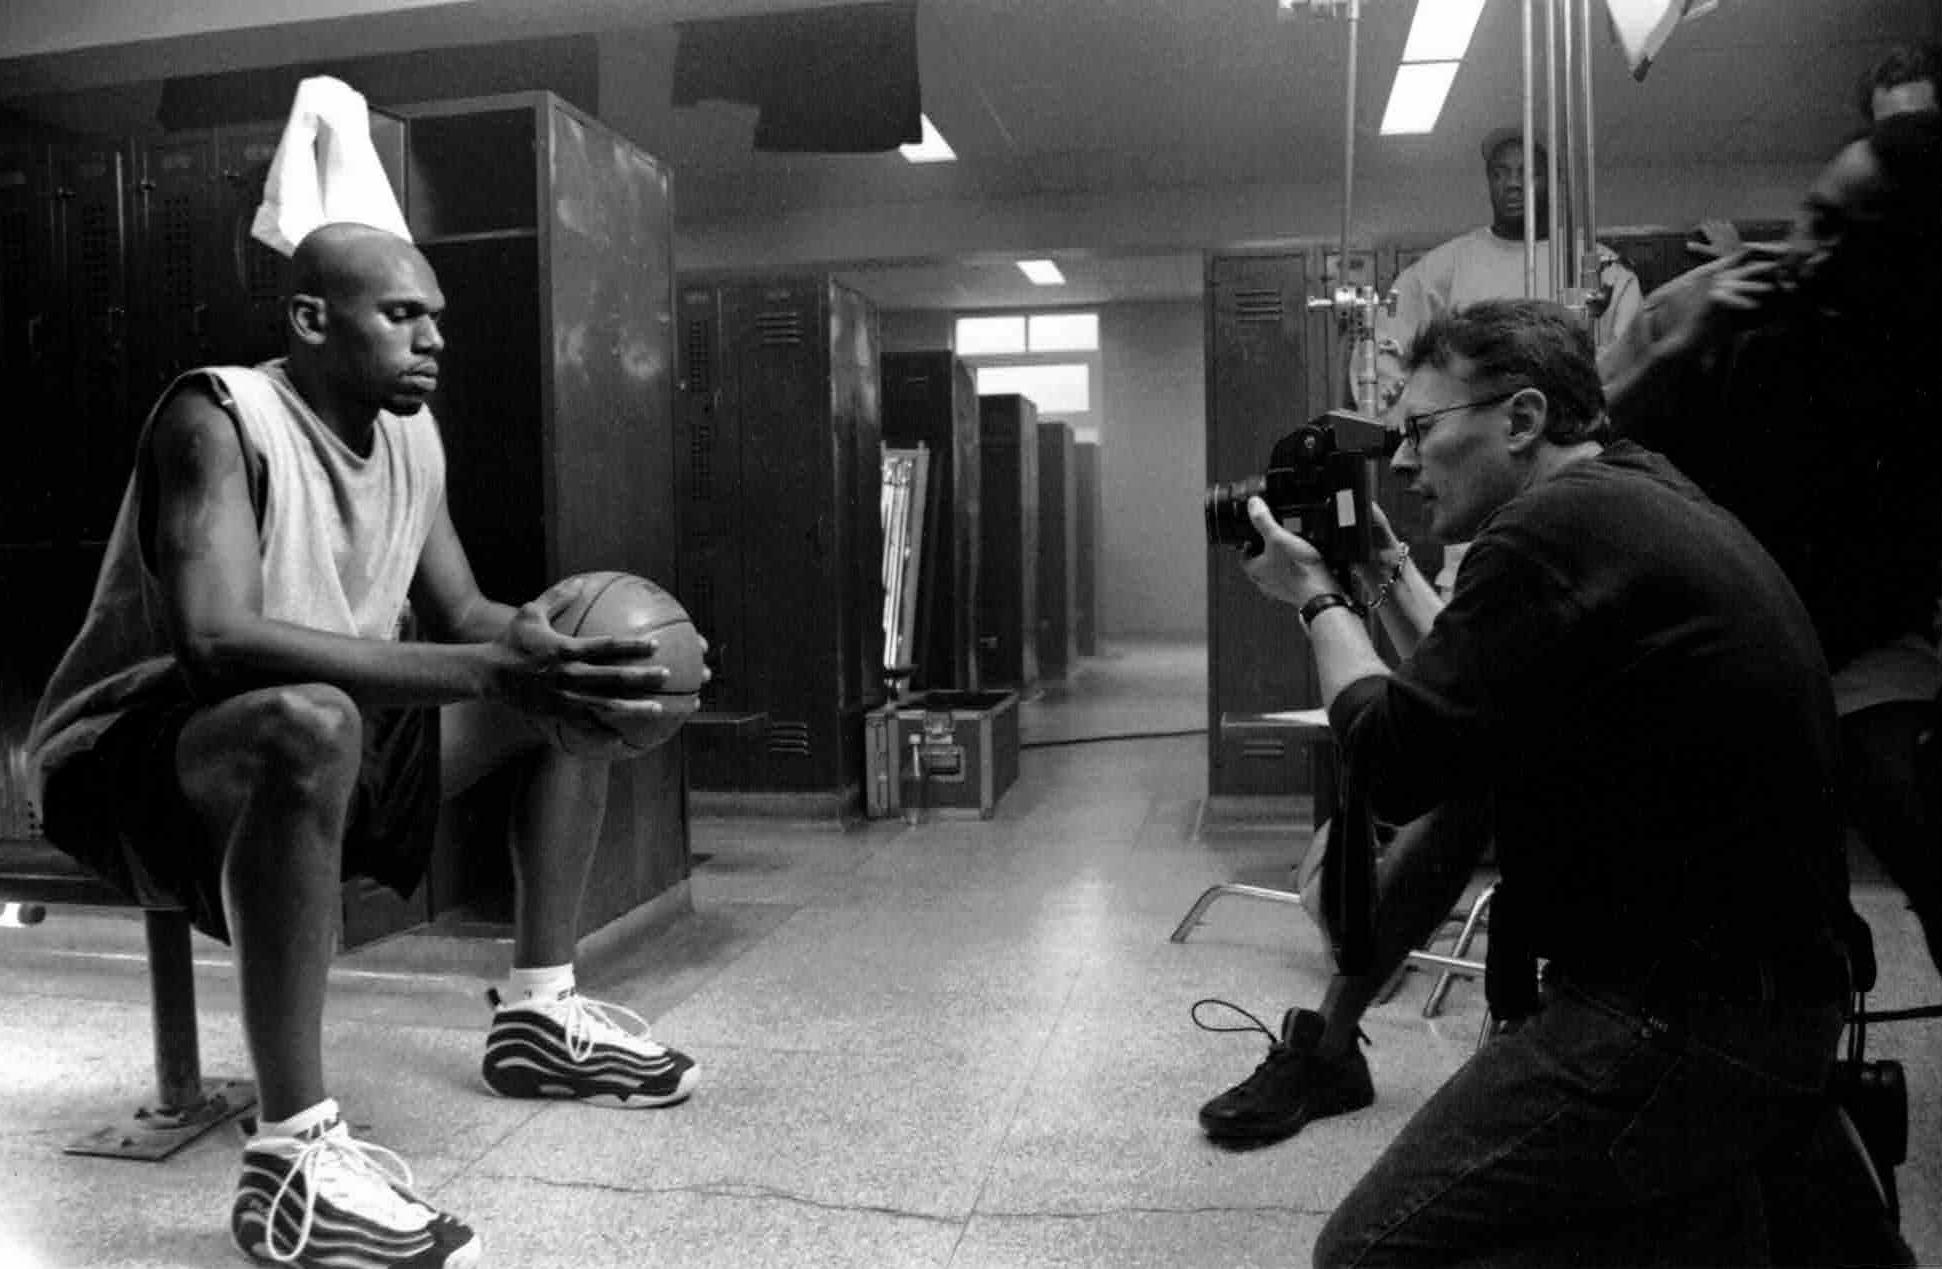 Jerry Stackhouse Detroit Pistons